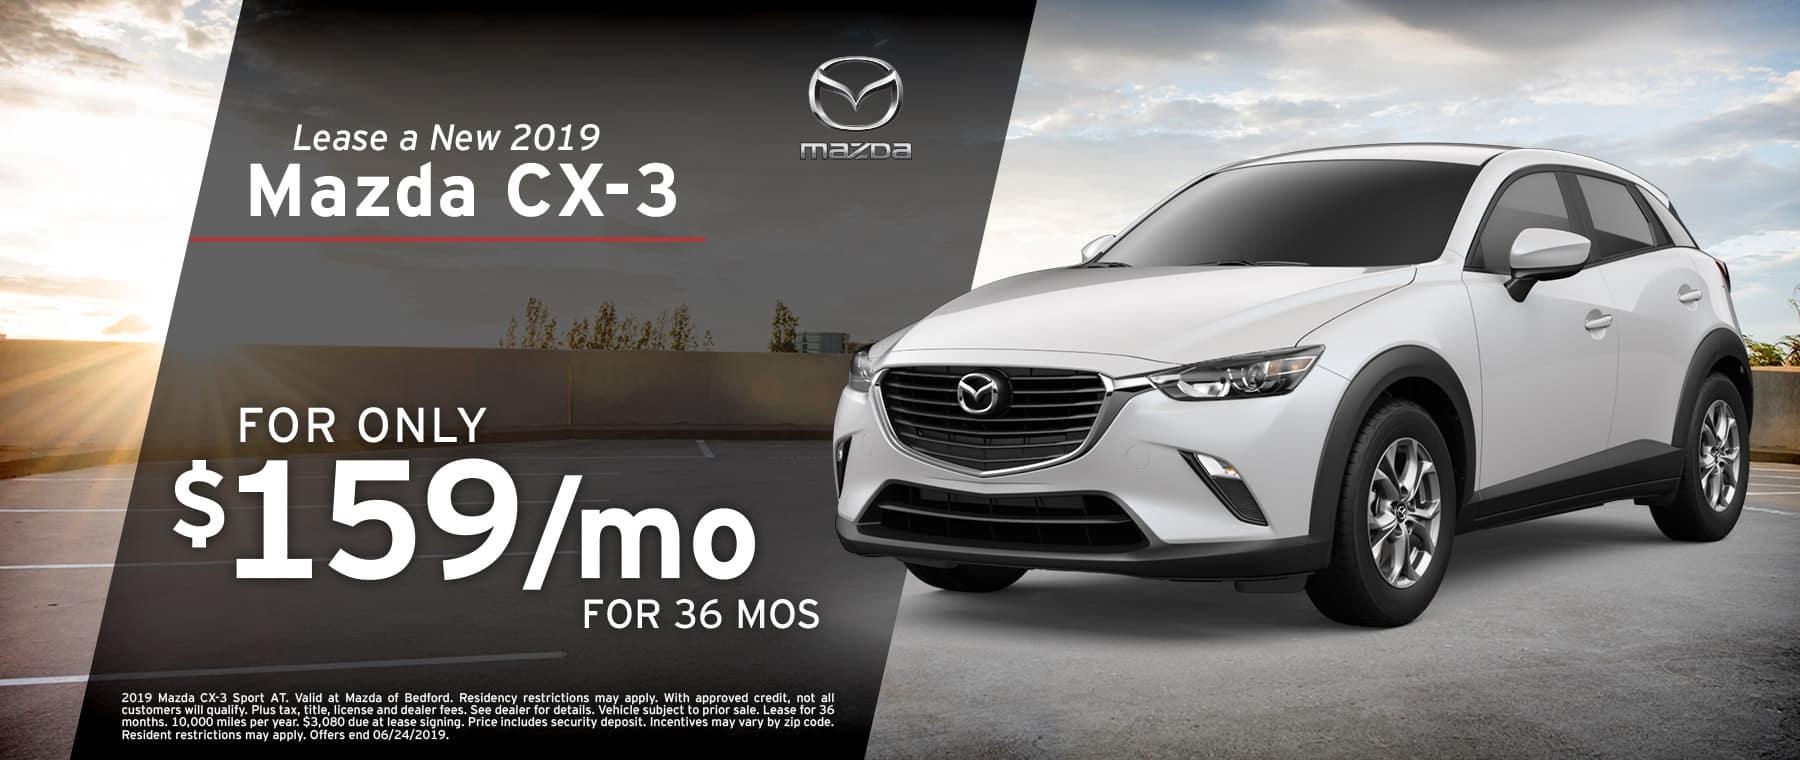 2019 Mazda CX-3 Lease Offer